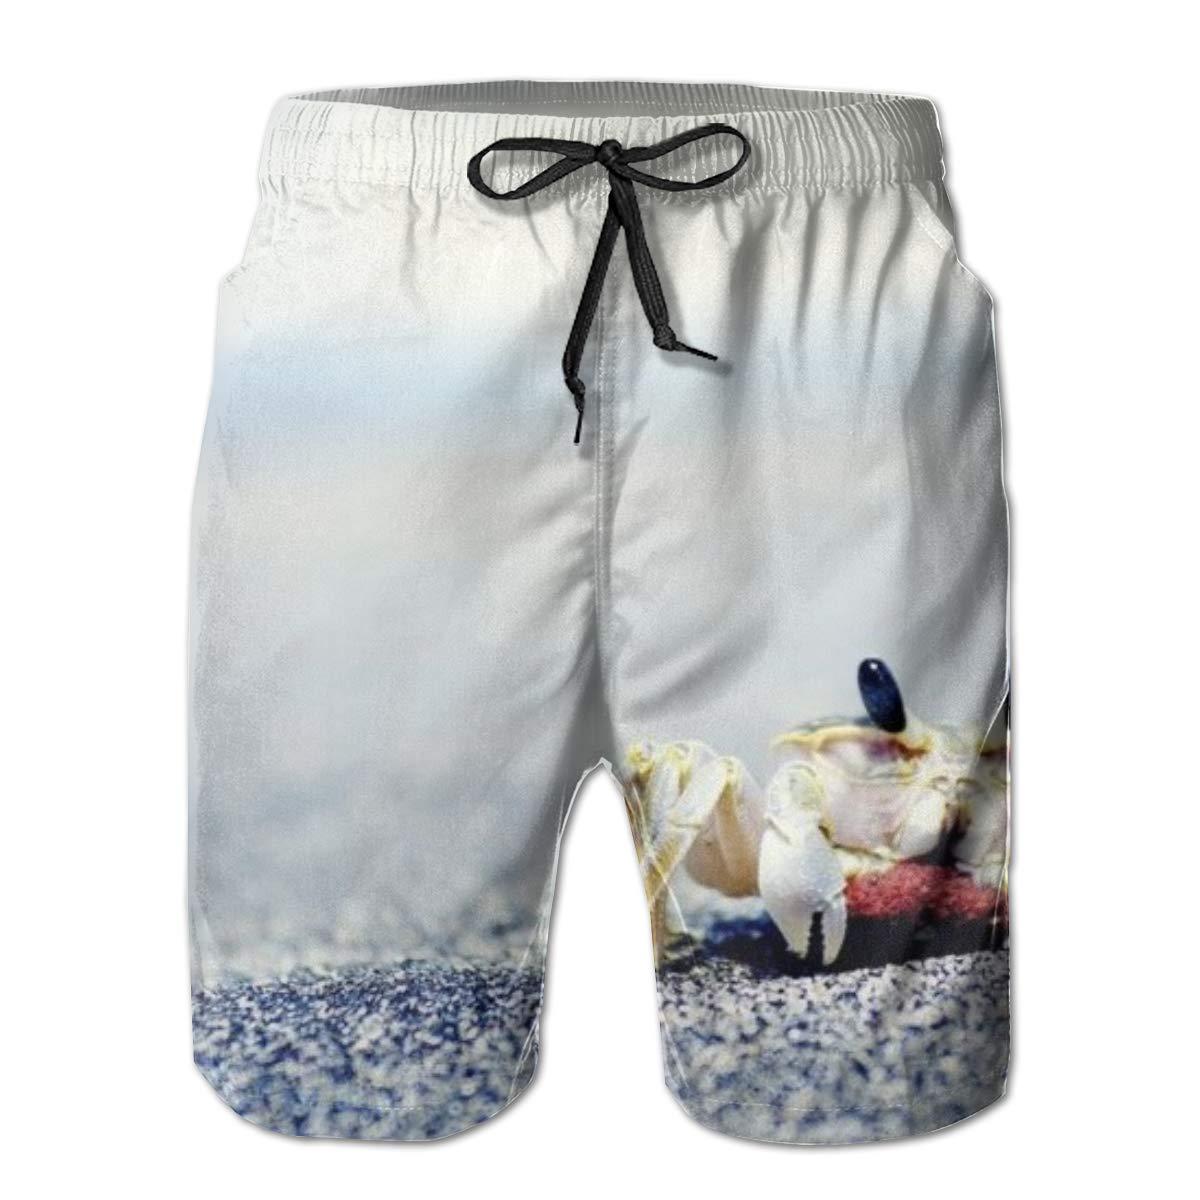 Crab Summer Holiday Mesh Lining Swimwear Board Shorts with Pockets Hateone Mens Beach Shorts Quick Dry